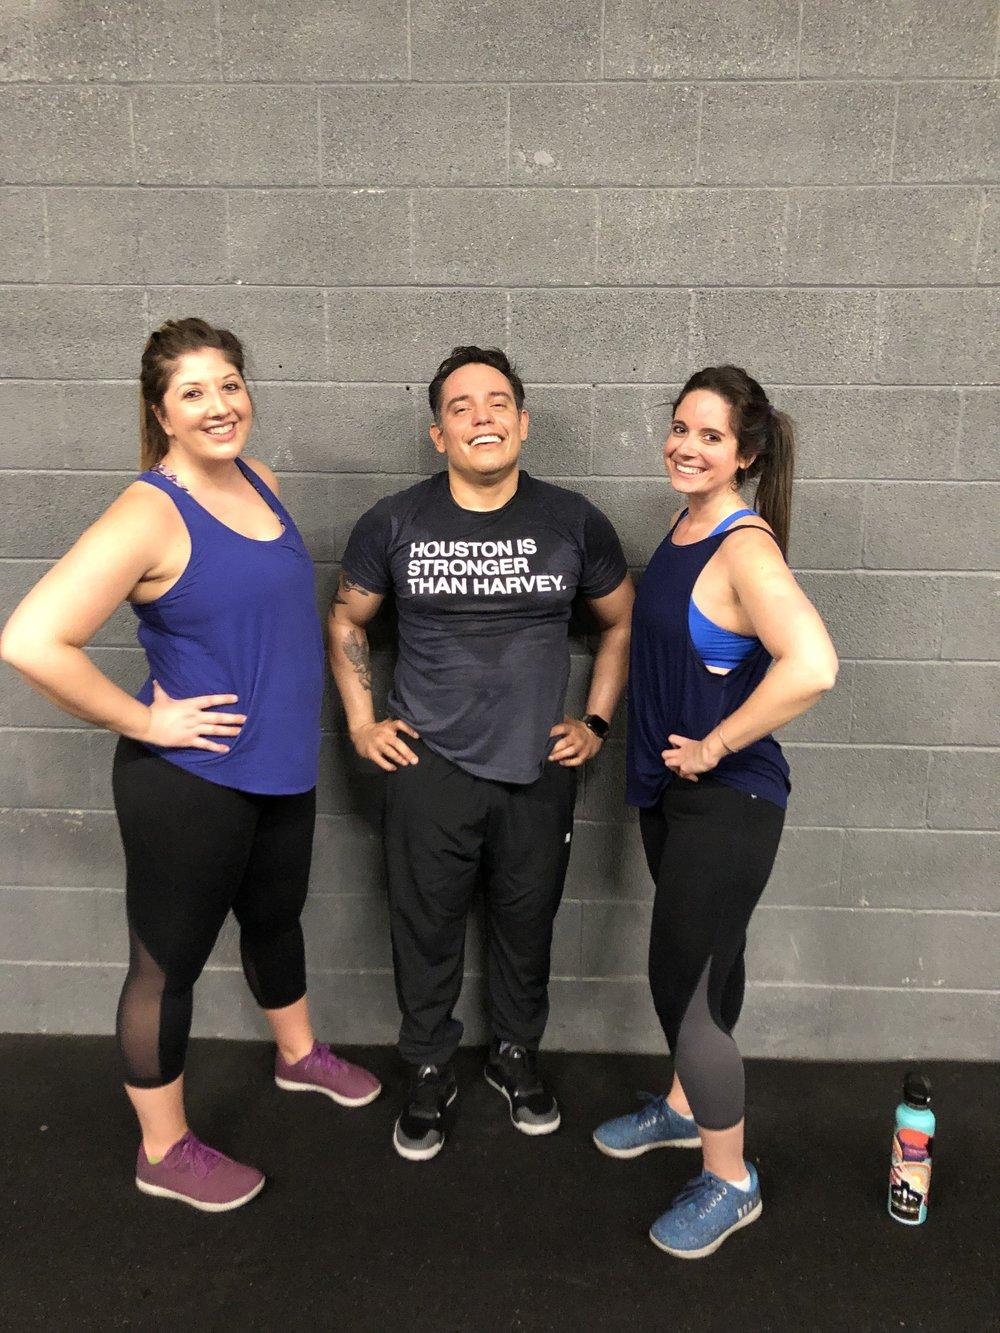 Allie, Manny, Samantha: CFCL Original Members